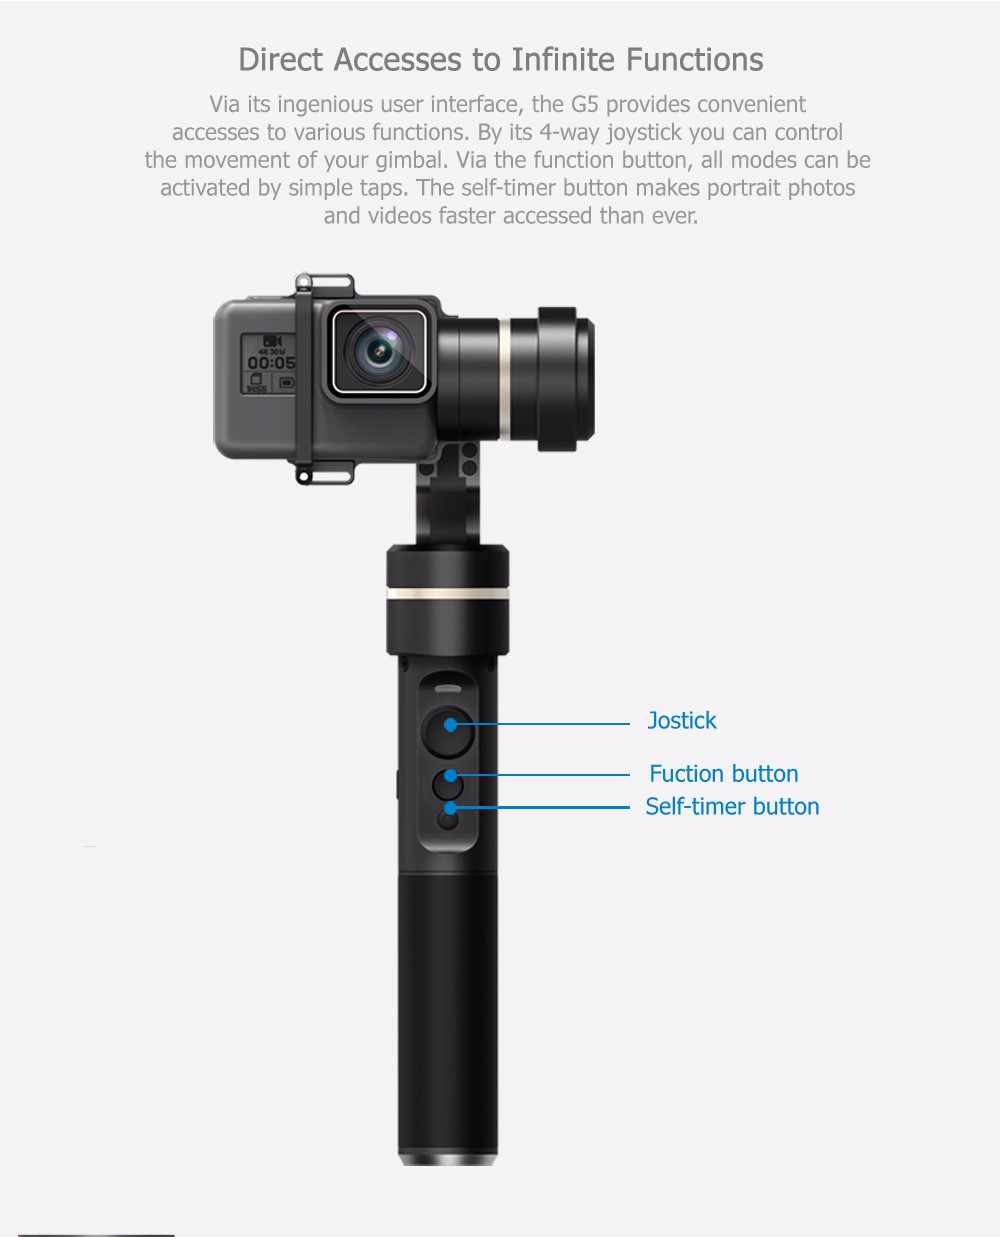 FeiyuTech Feiyu G5 Splash Proof waterproof 3-Axis Handheld Action Camera Gimbal For GoPro HERO 6 5 4 3 3+ Xiaomi yi 4k SJ AEE 15